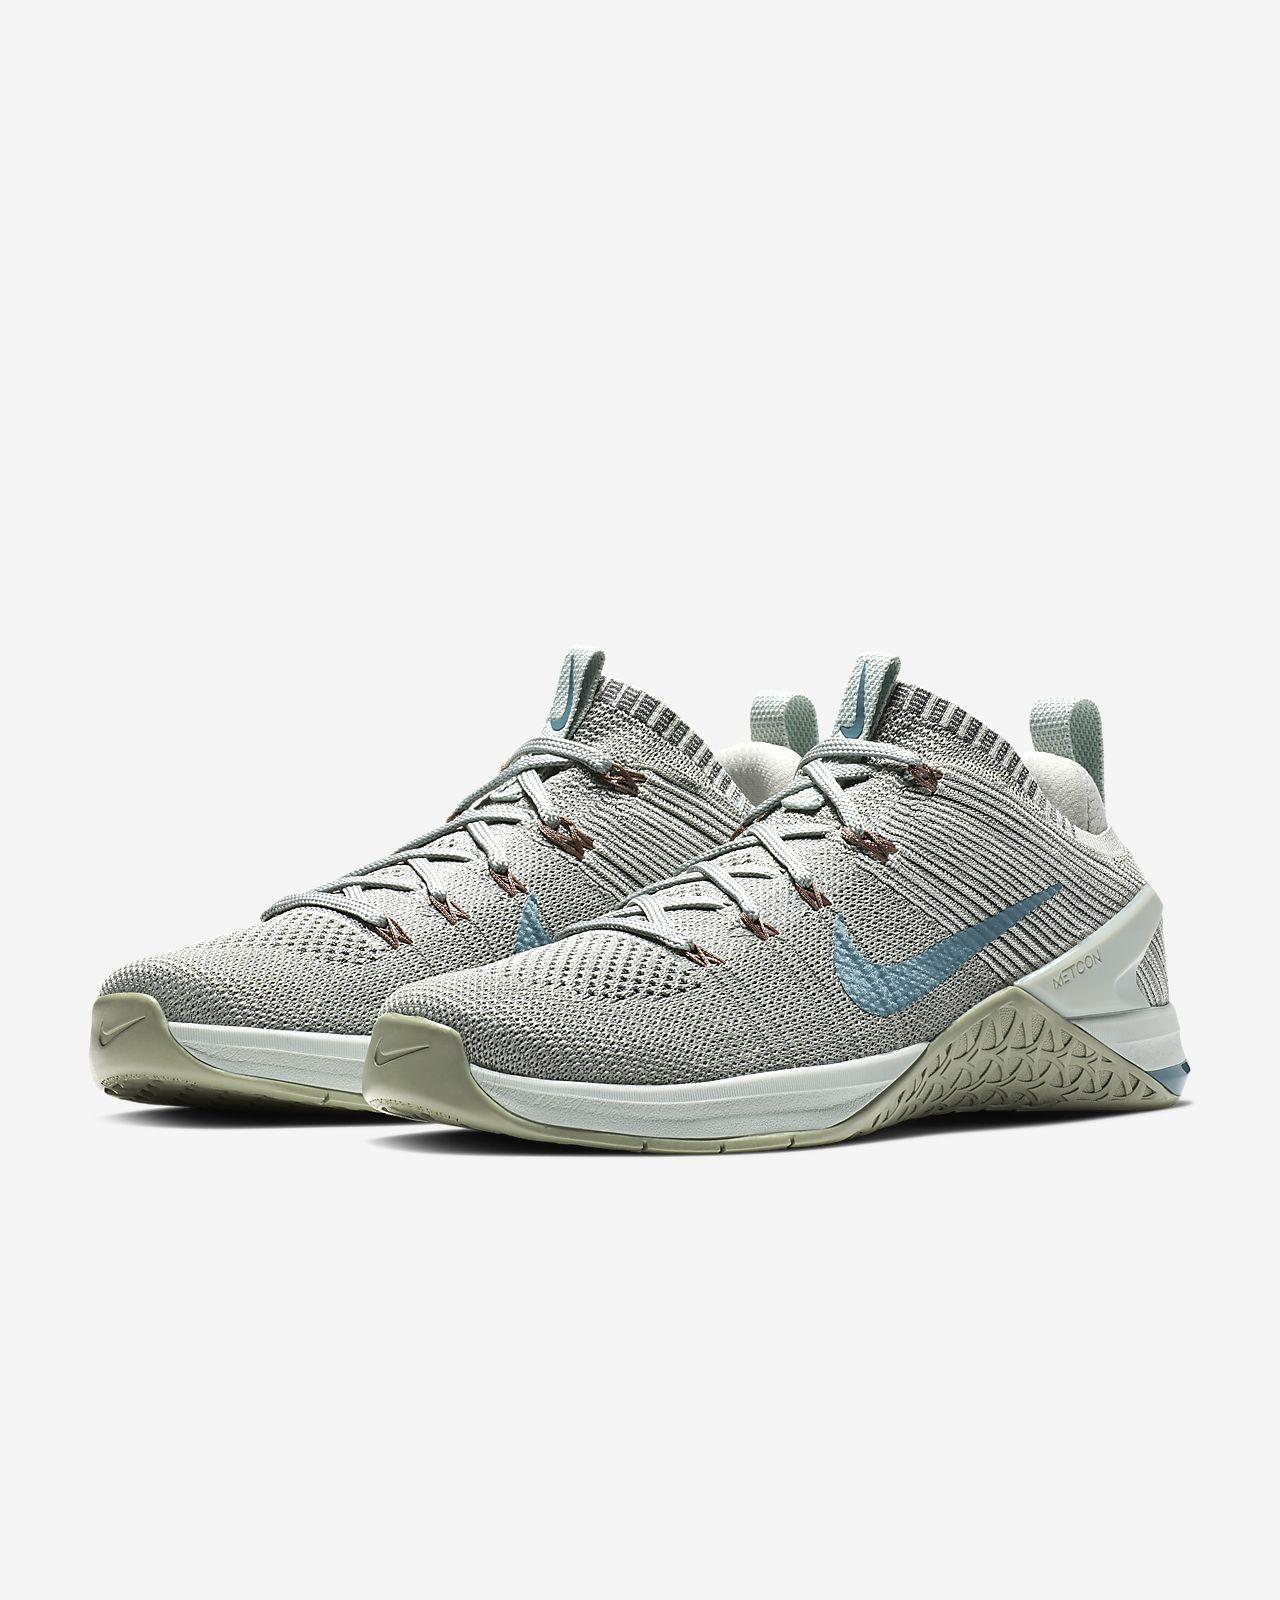 04c366a42a06 Nike Metcon DSX Flyknit 2 Women s Cross Training Weightlifting Shoe ...